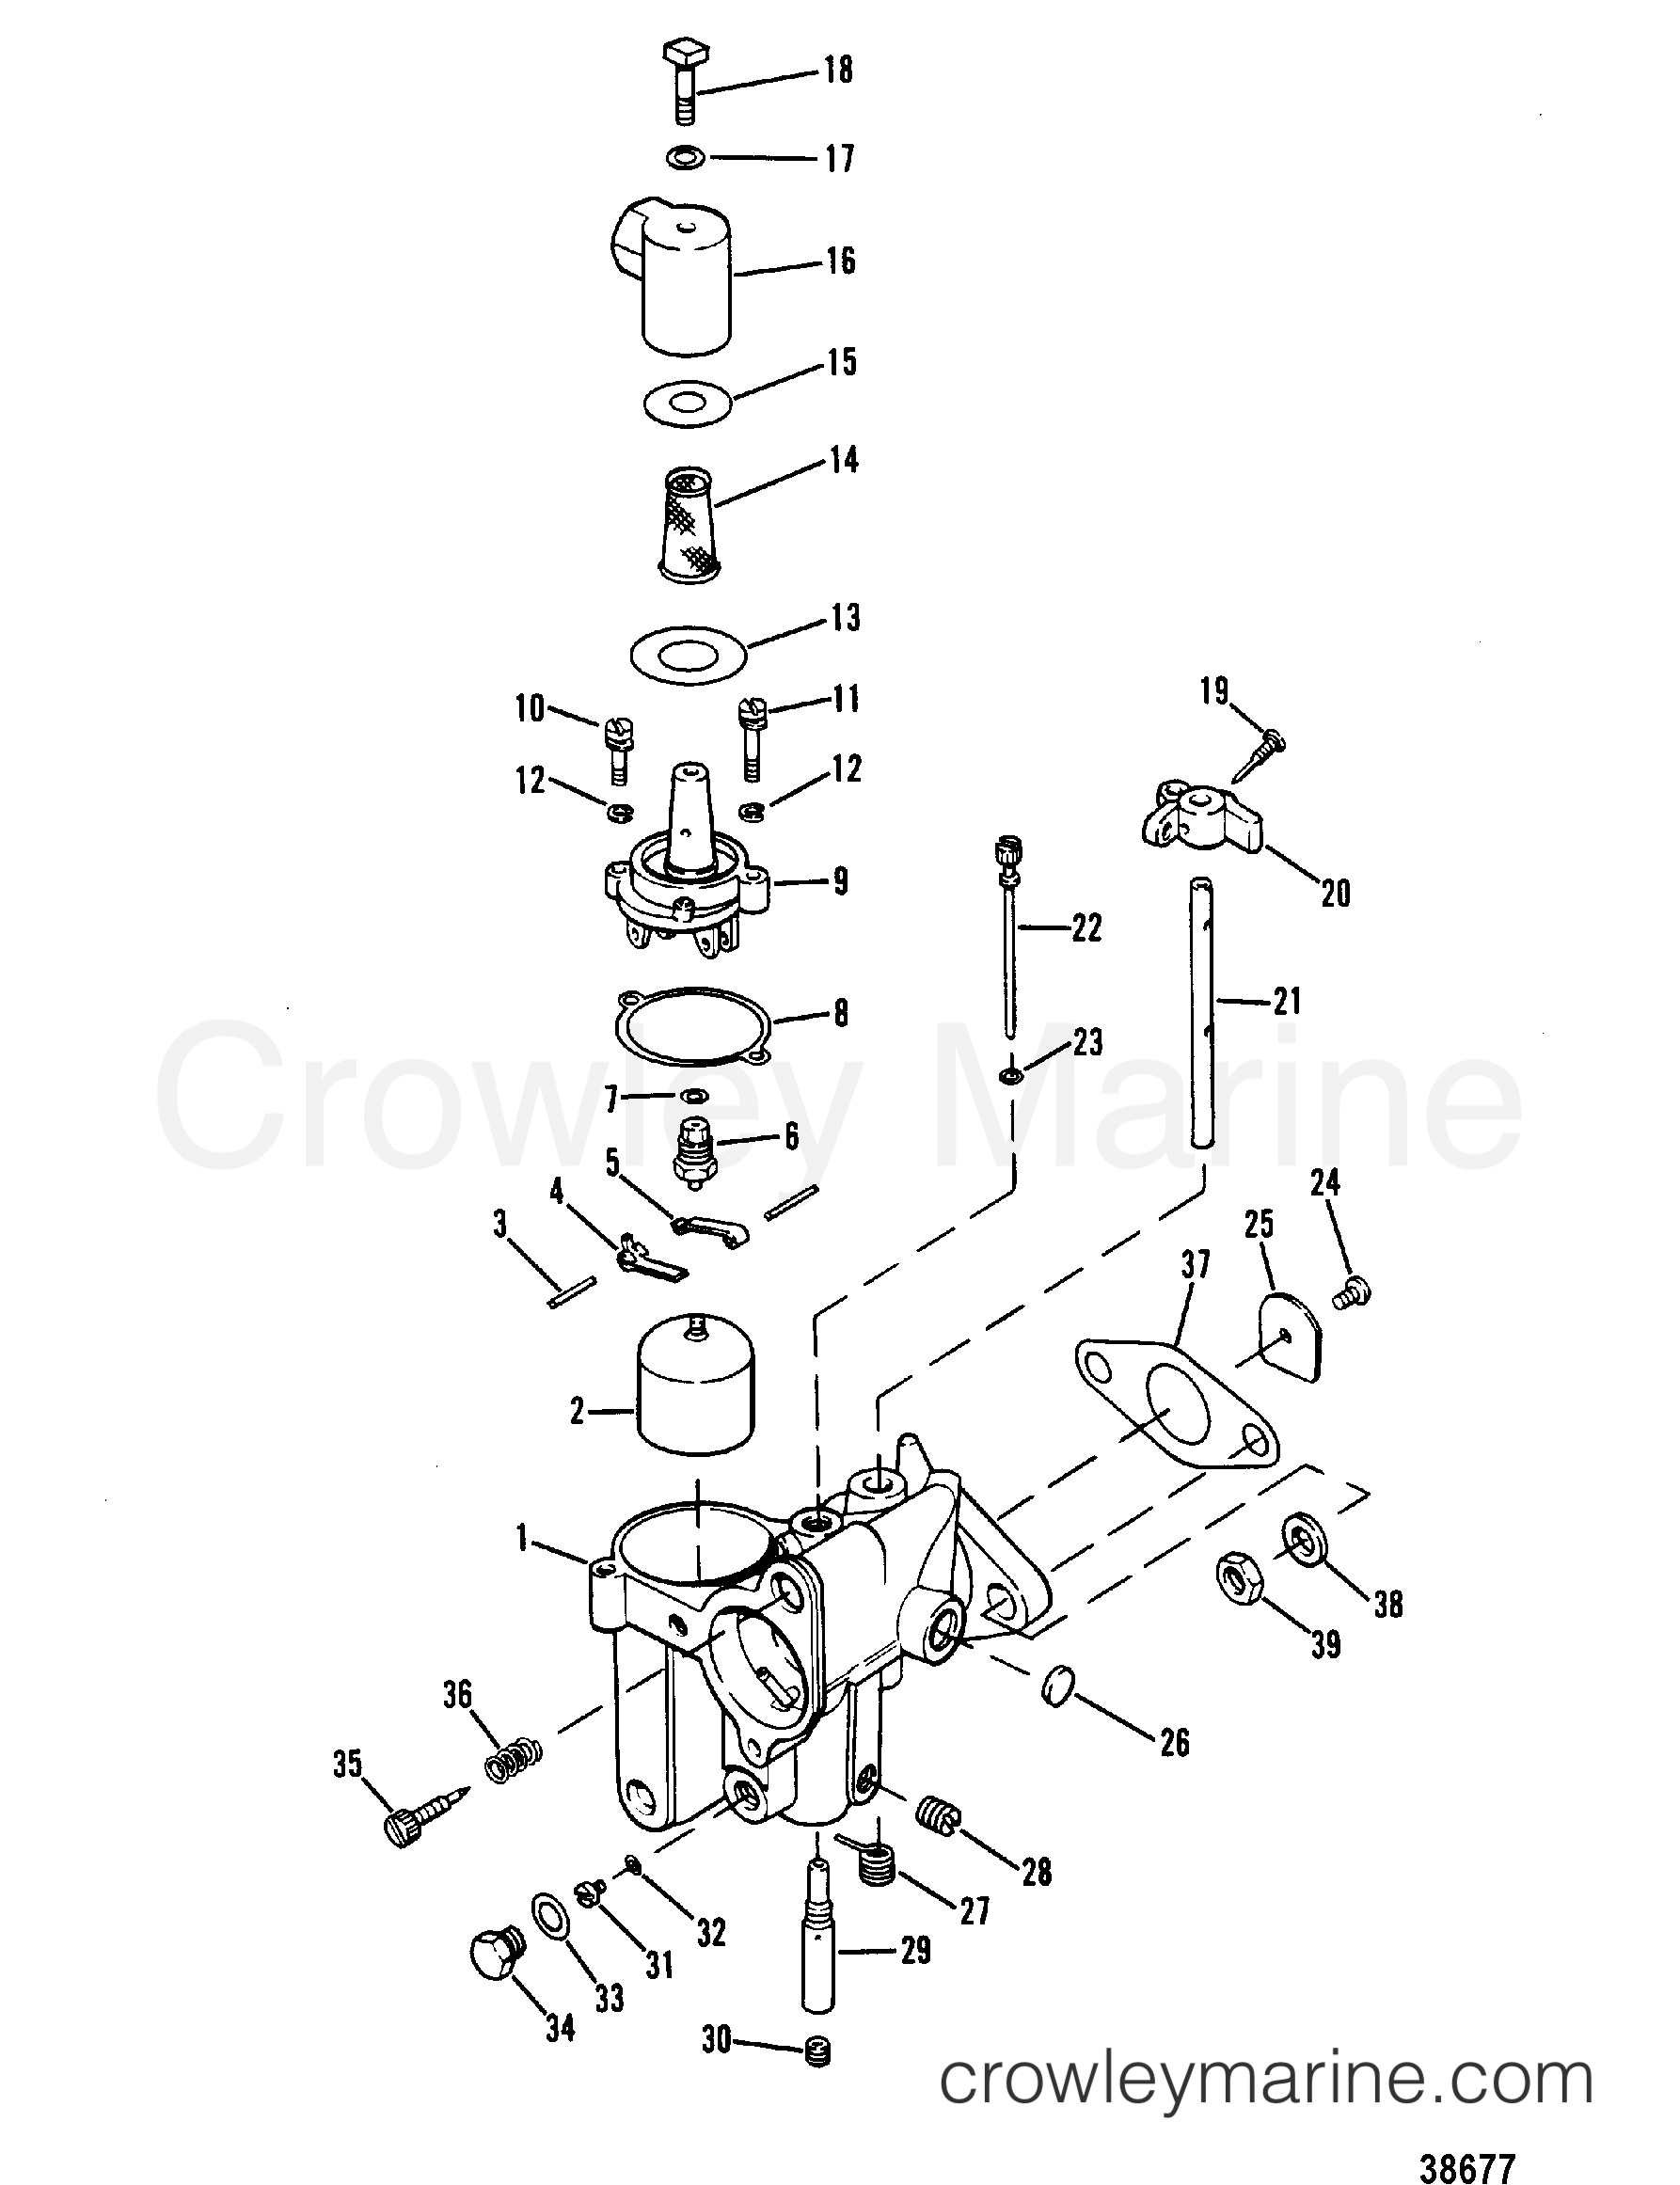 carburetor assembly tillotson